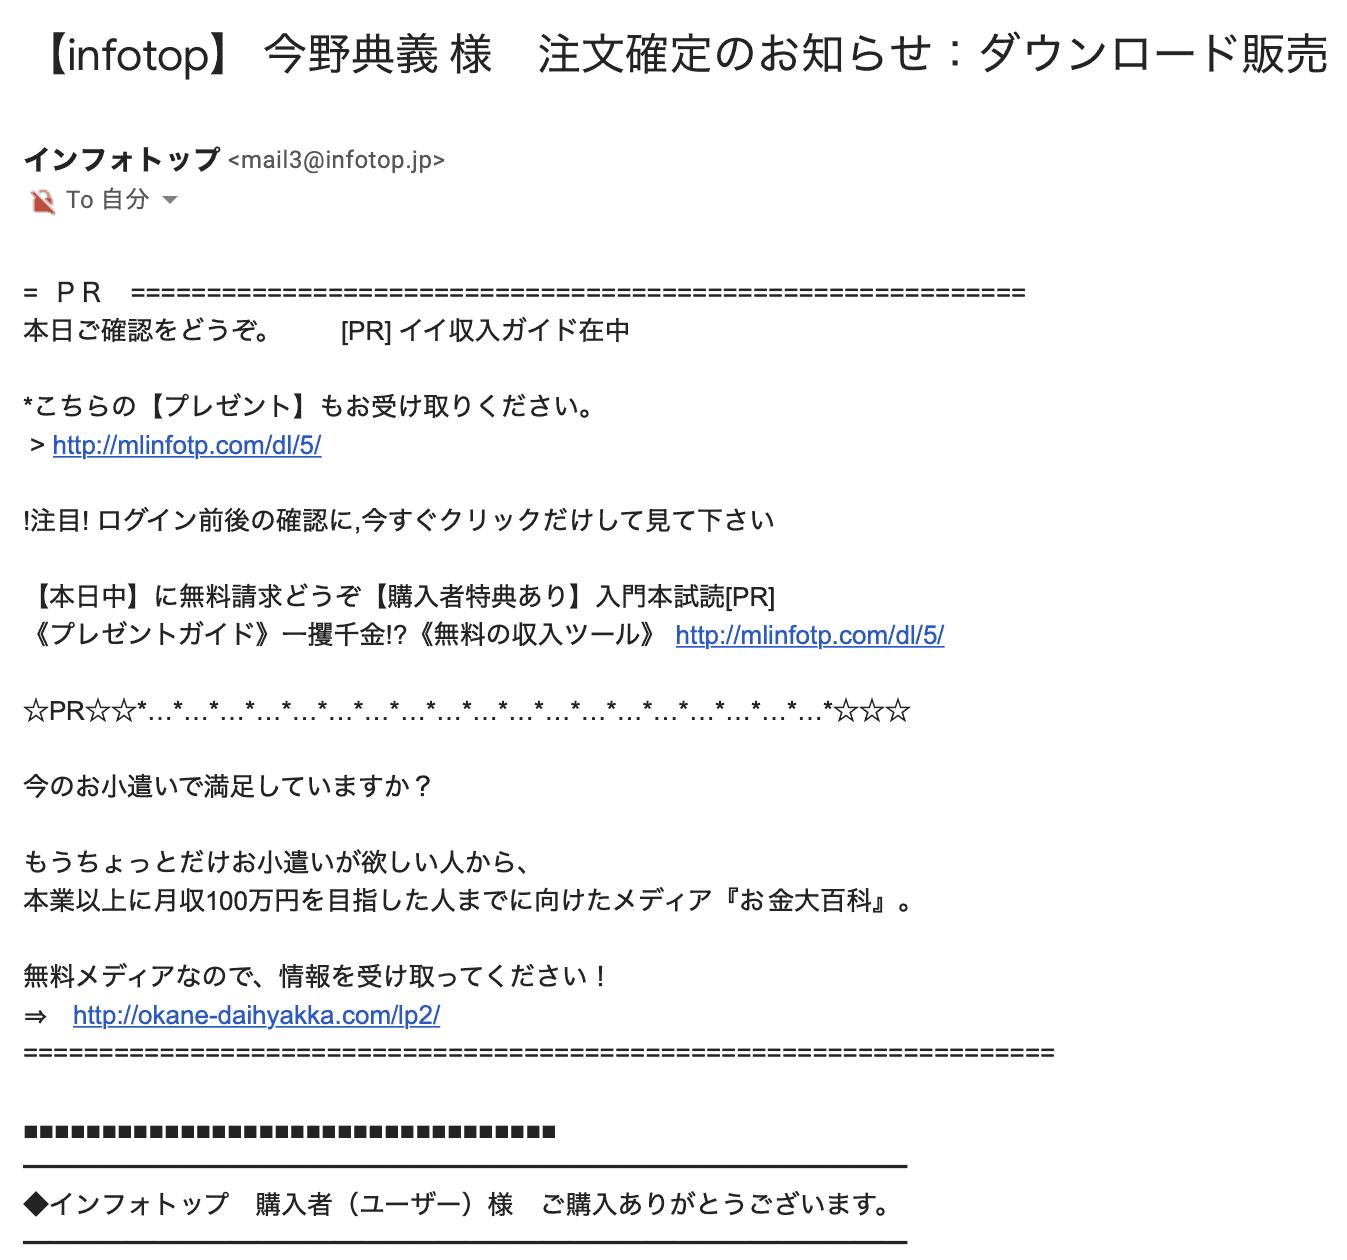 AFFINGER5 infotop購入メール